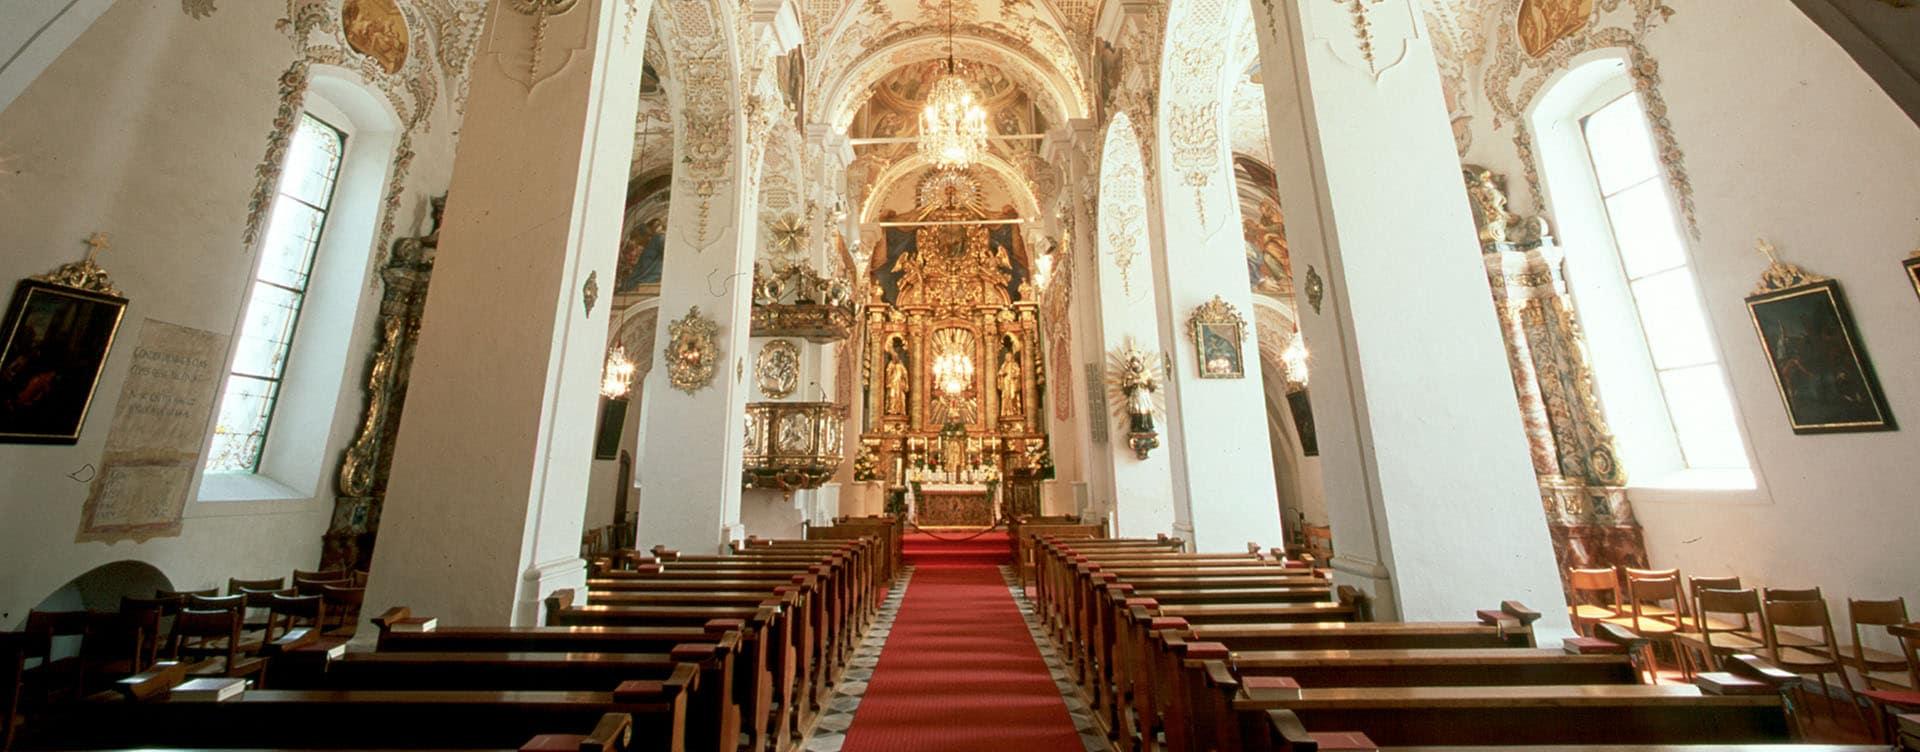 Stiftskirche Ossiach © CS Archiv